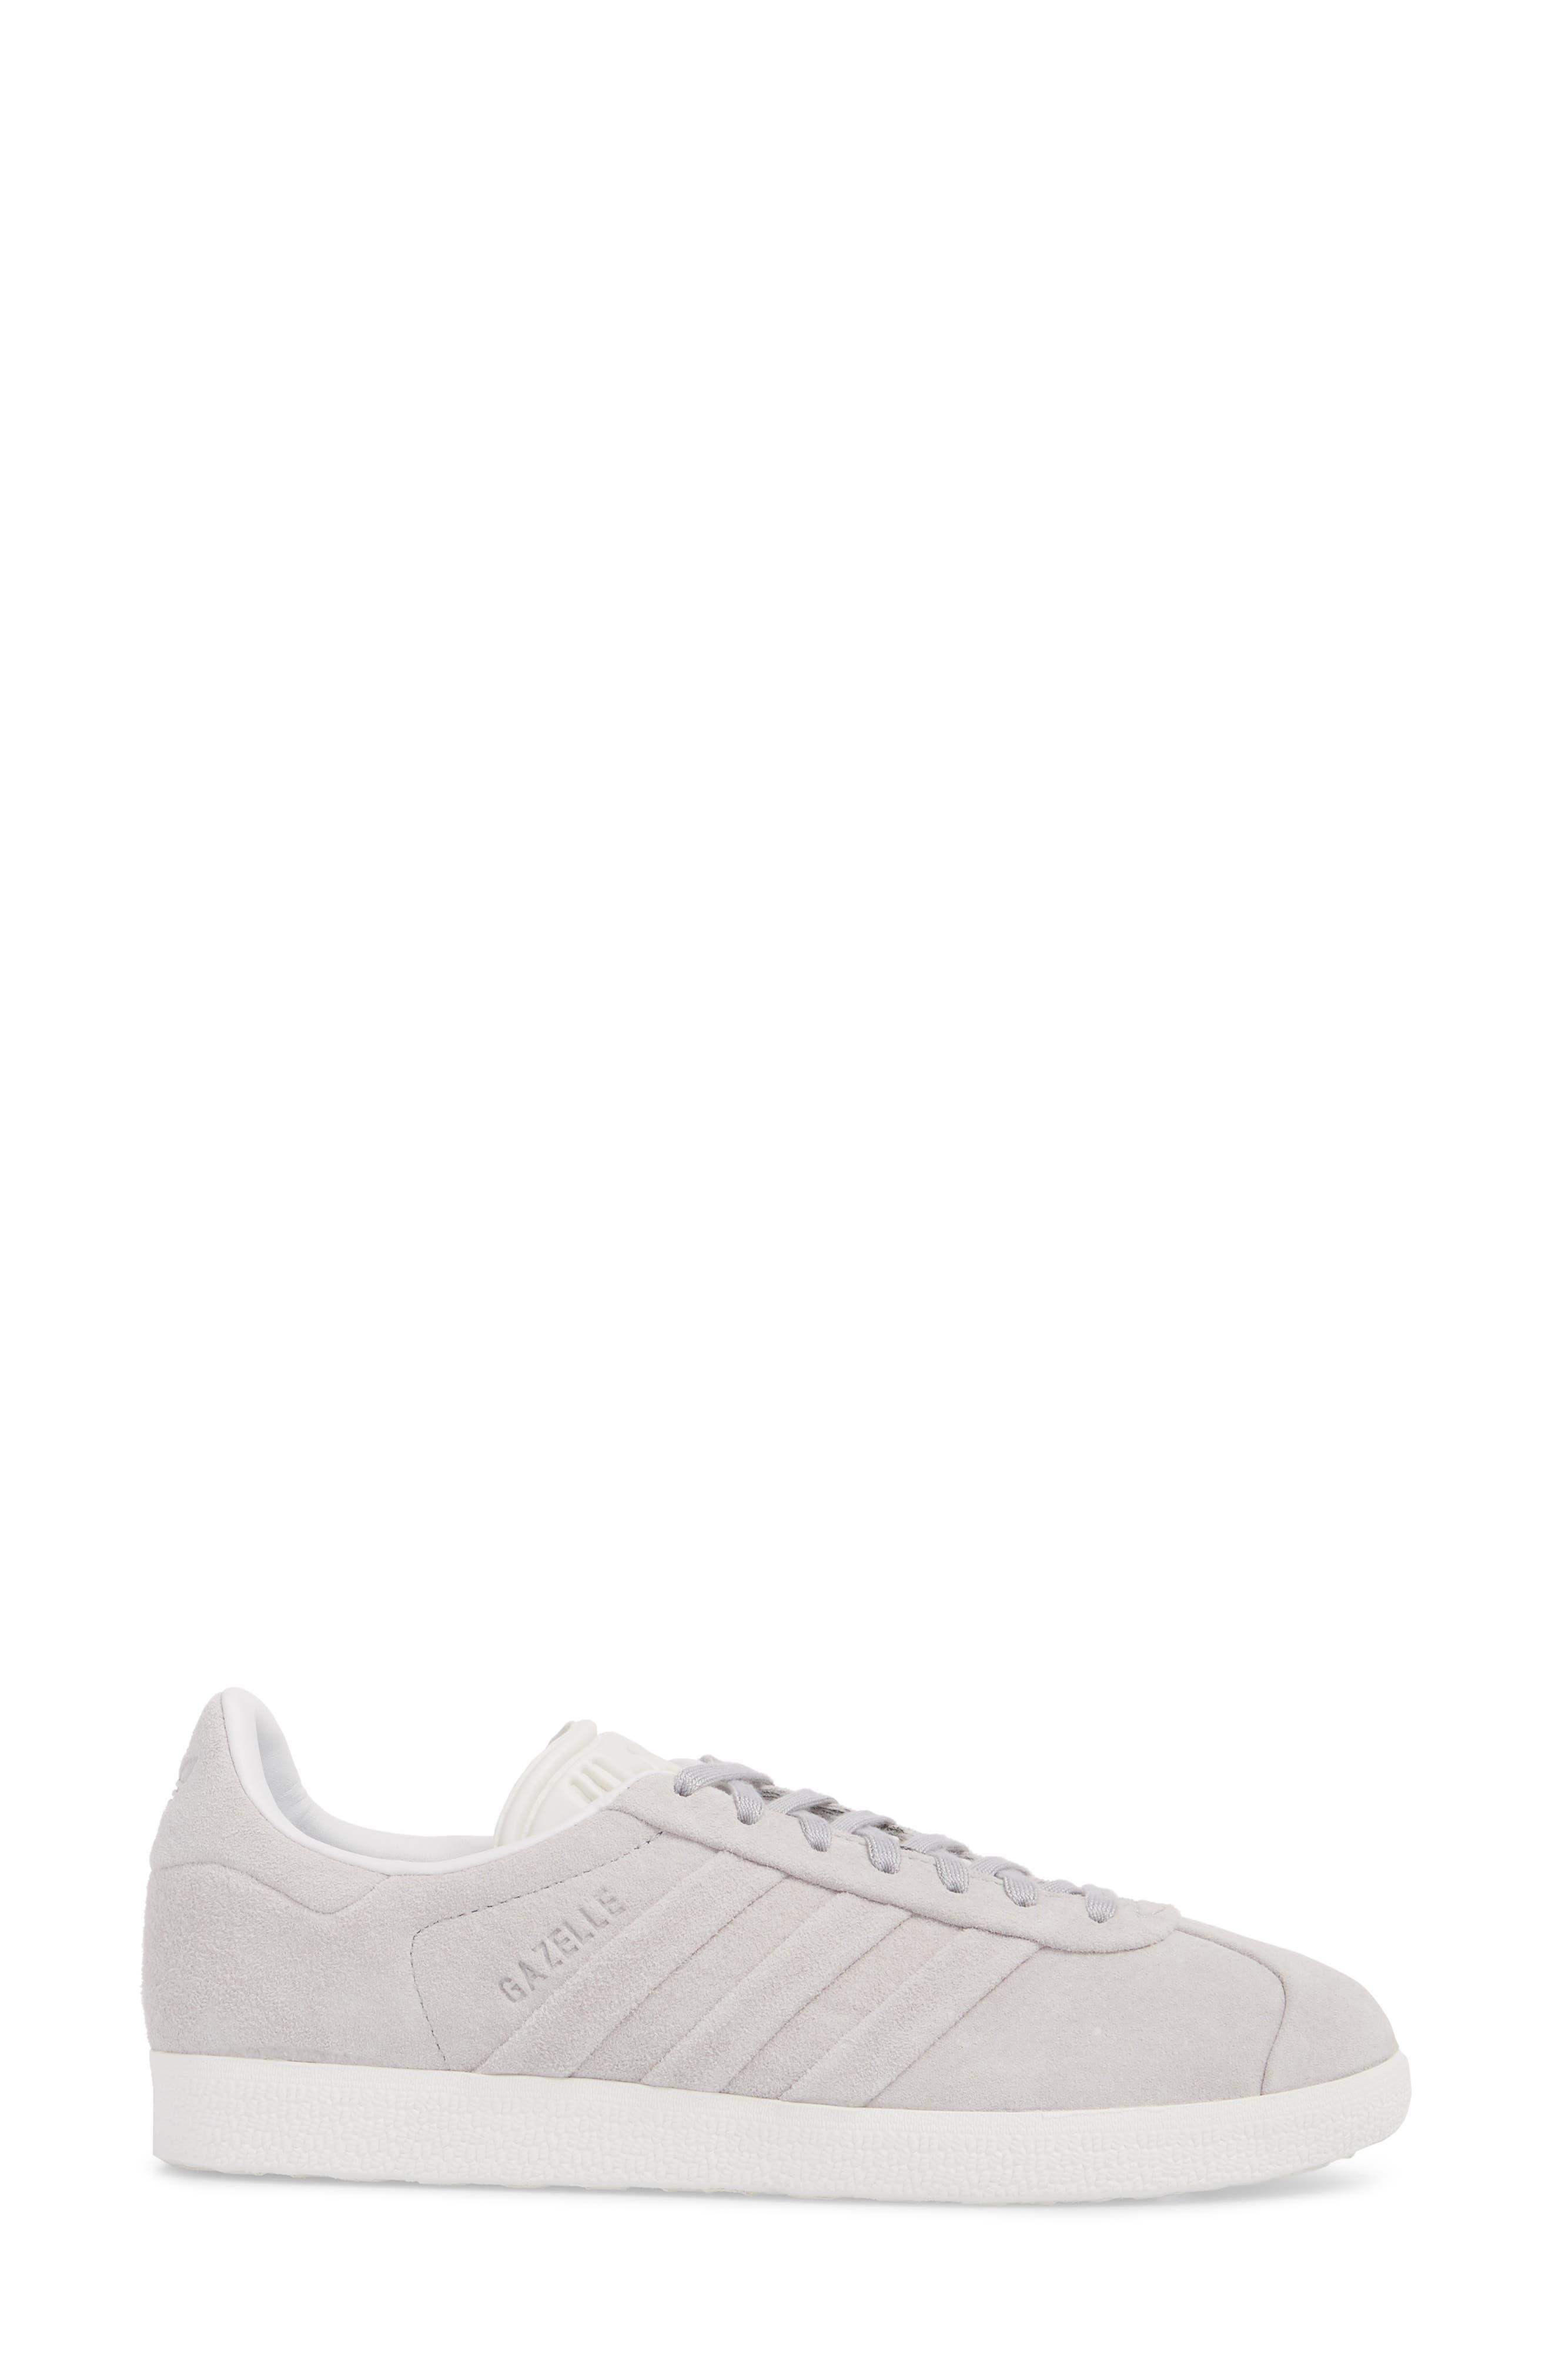 Gazelle Stitch & Turn Sneaker,                             Alternate thumbnail 3, color,                             GREY/ GREY/ WHITE